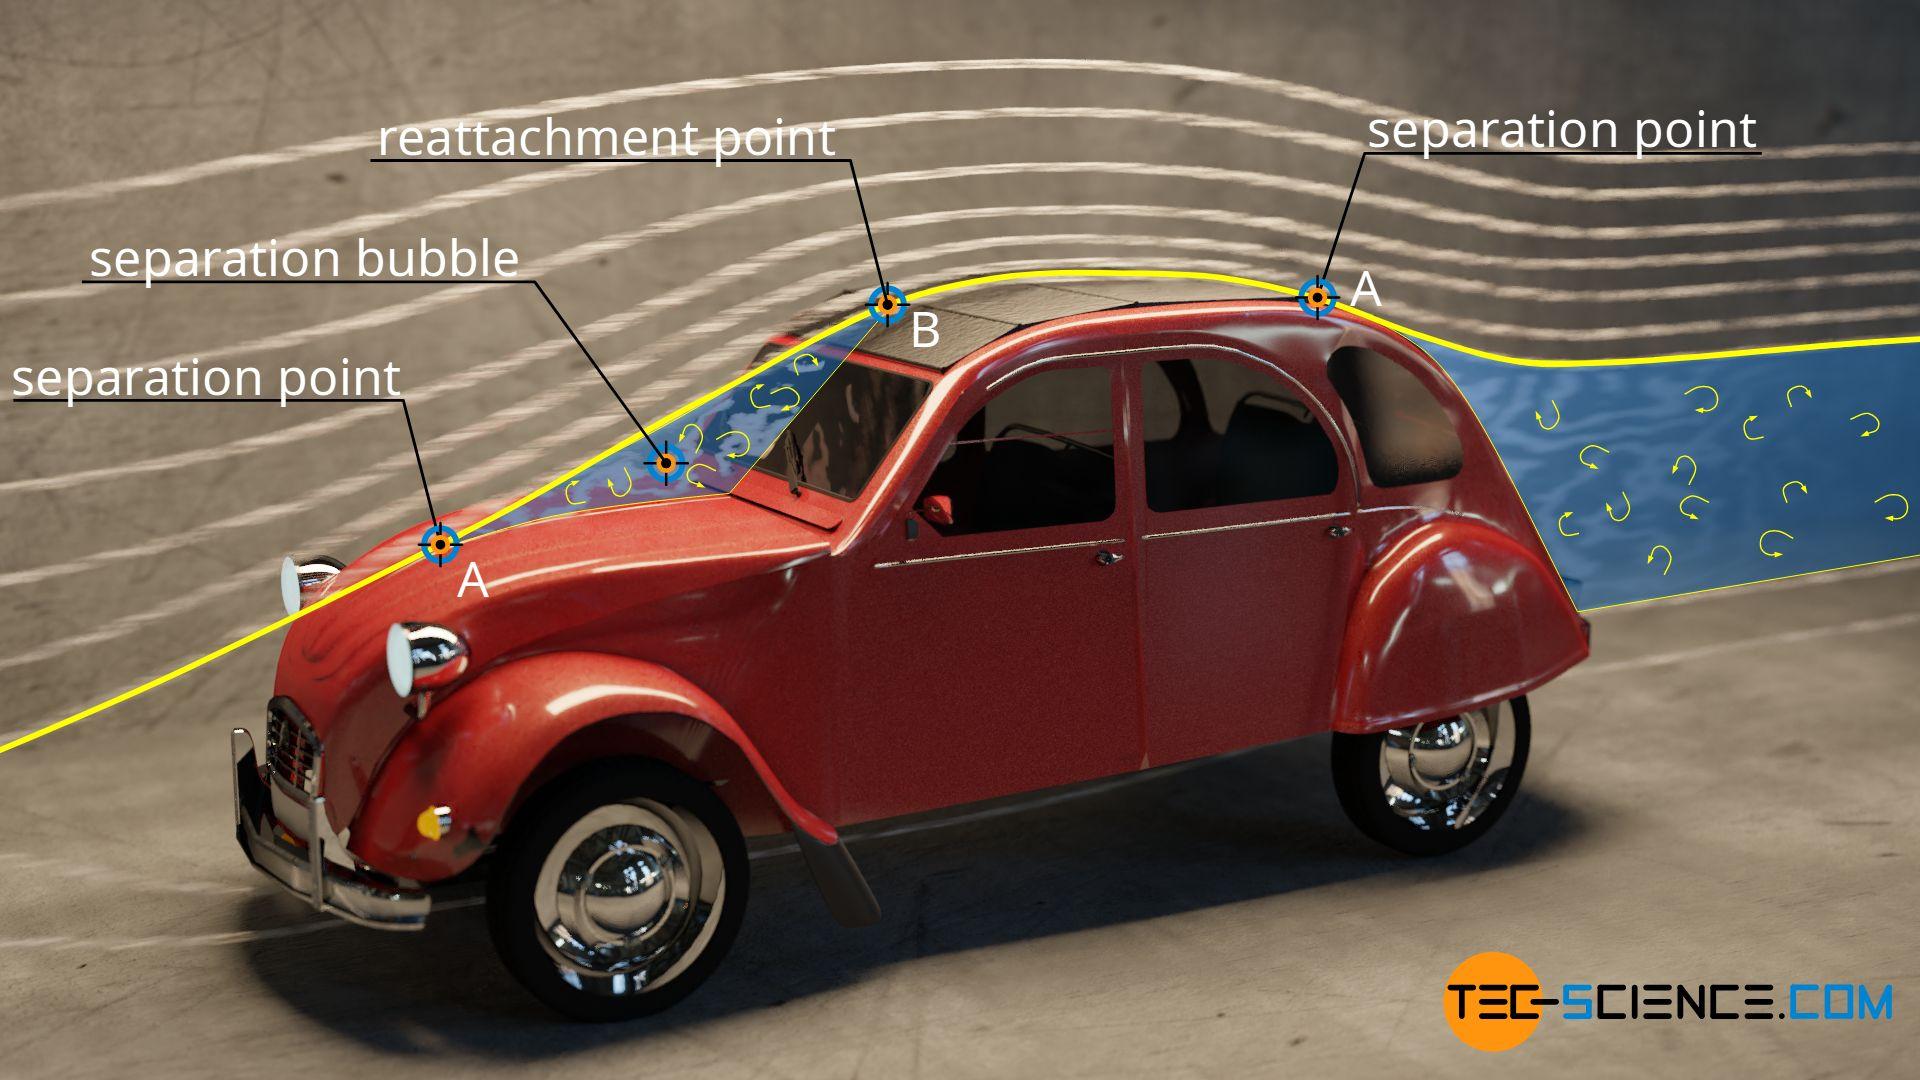 Separation bubble on a car